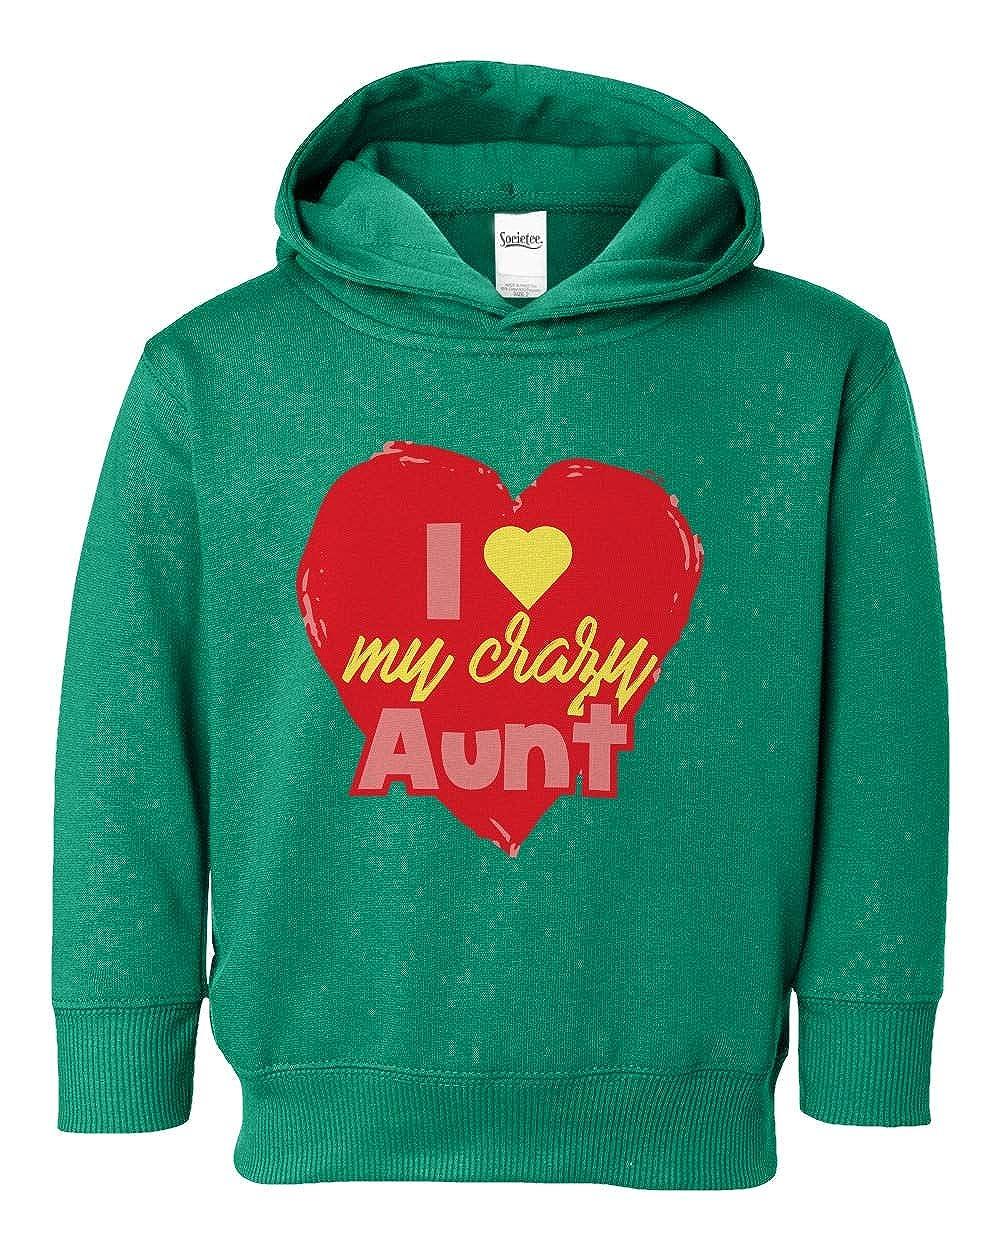 Societee I Love My Crazy Aunt Girls Boys Toddler Hooded Sweatshirt